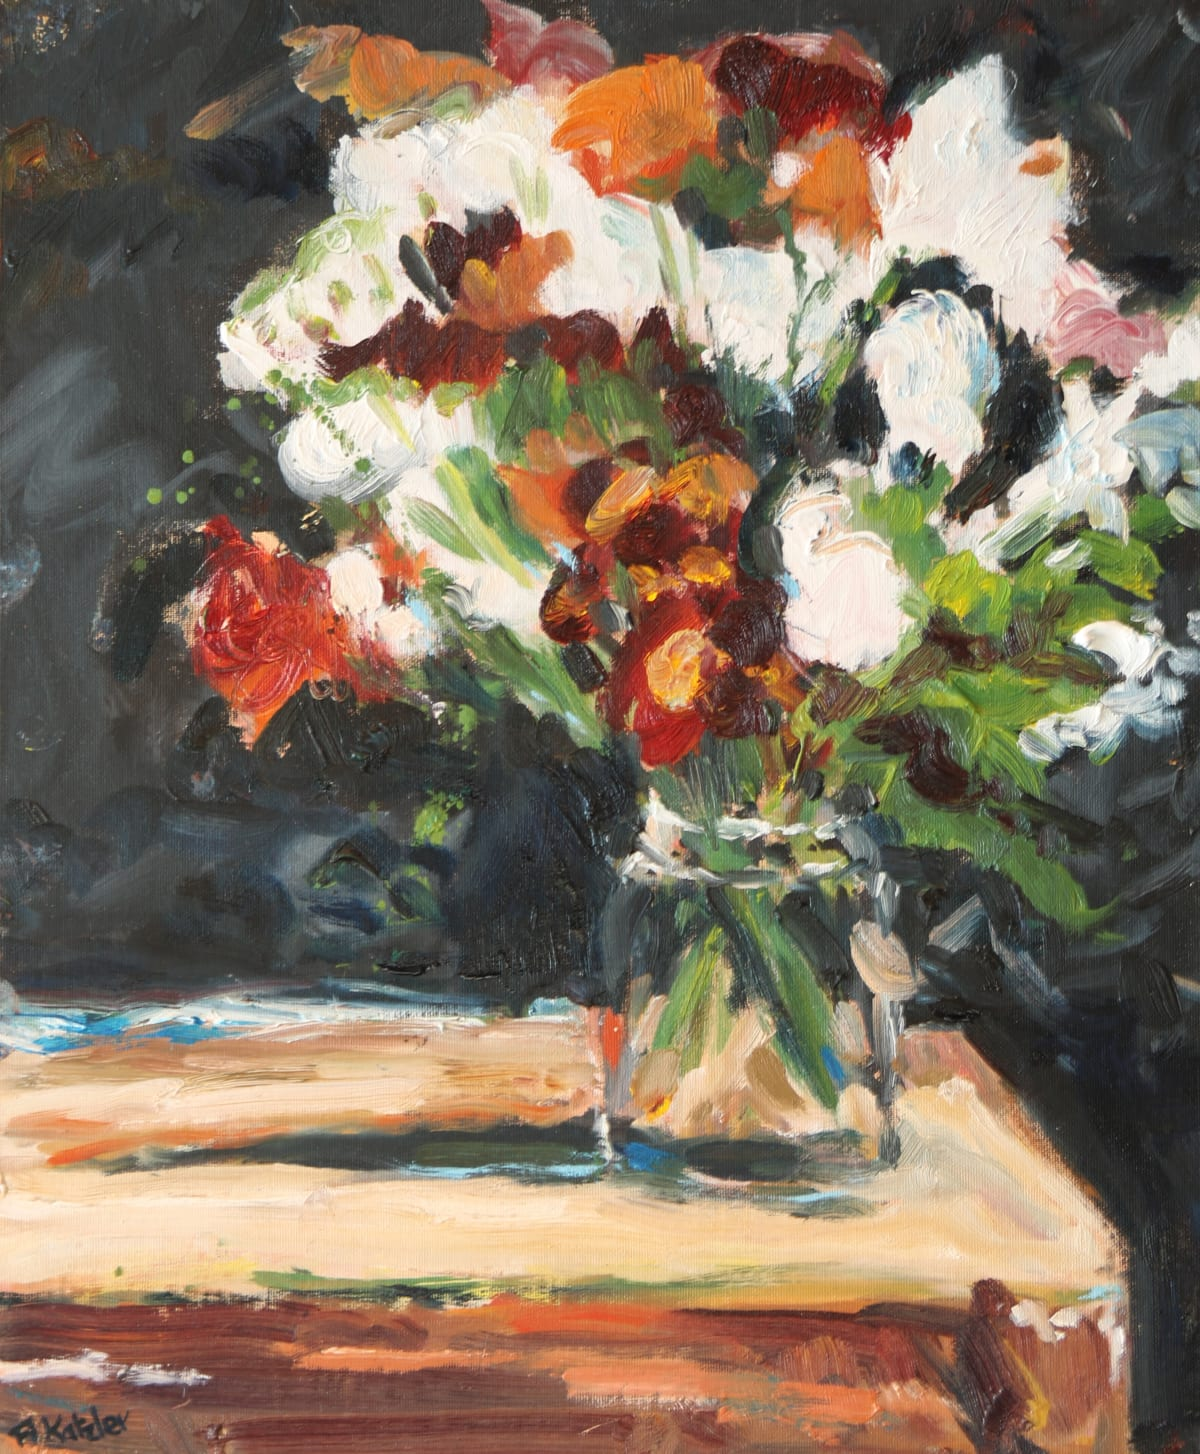 Fi Katzler MIXED BUNCH Oil on canvas board 18 x 15 in. 45.72 x 38.1 cm